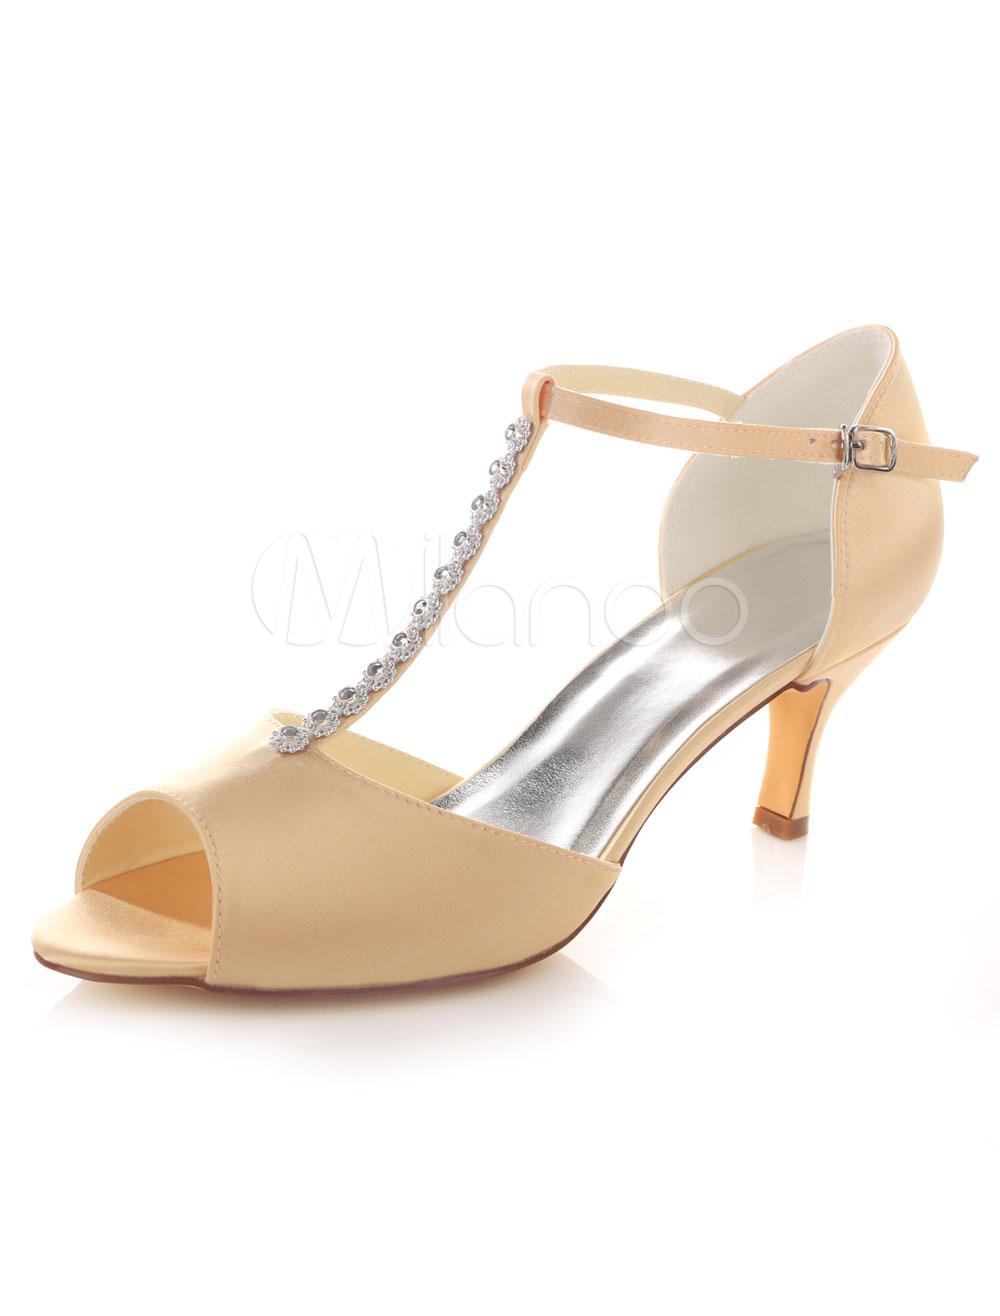 Peep Wedding Shoes Rhinestones T-strap High Heel Bridal Shoes